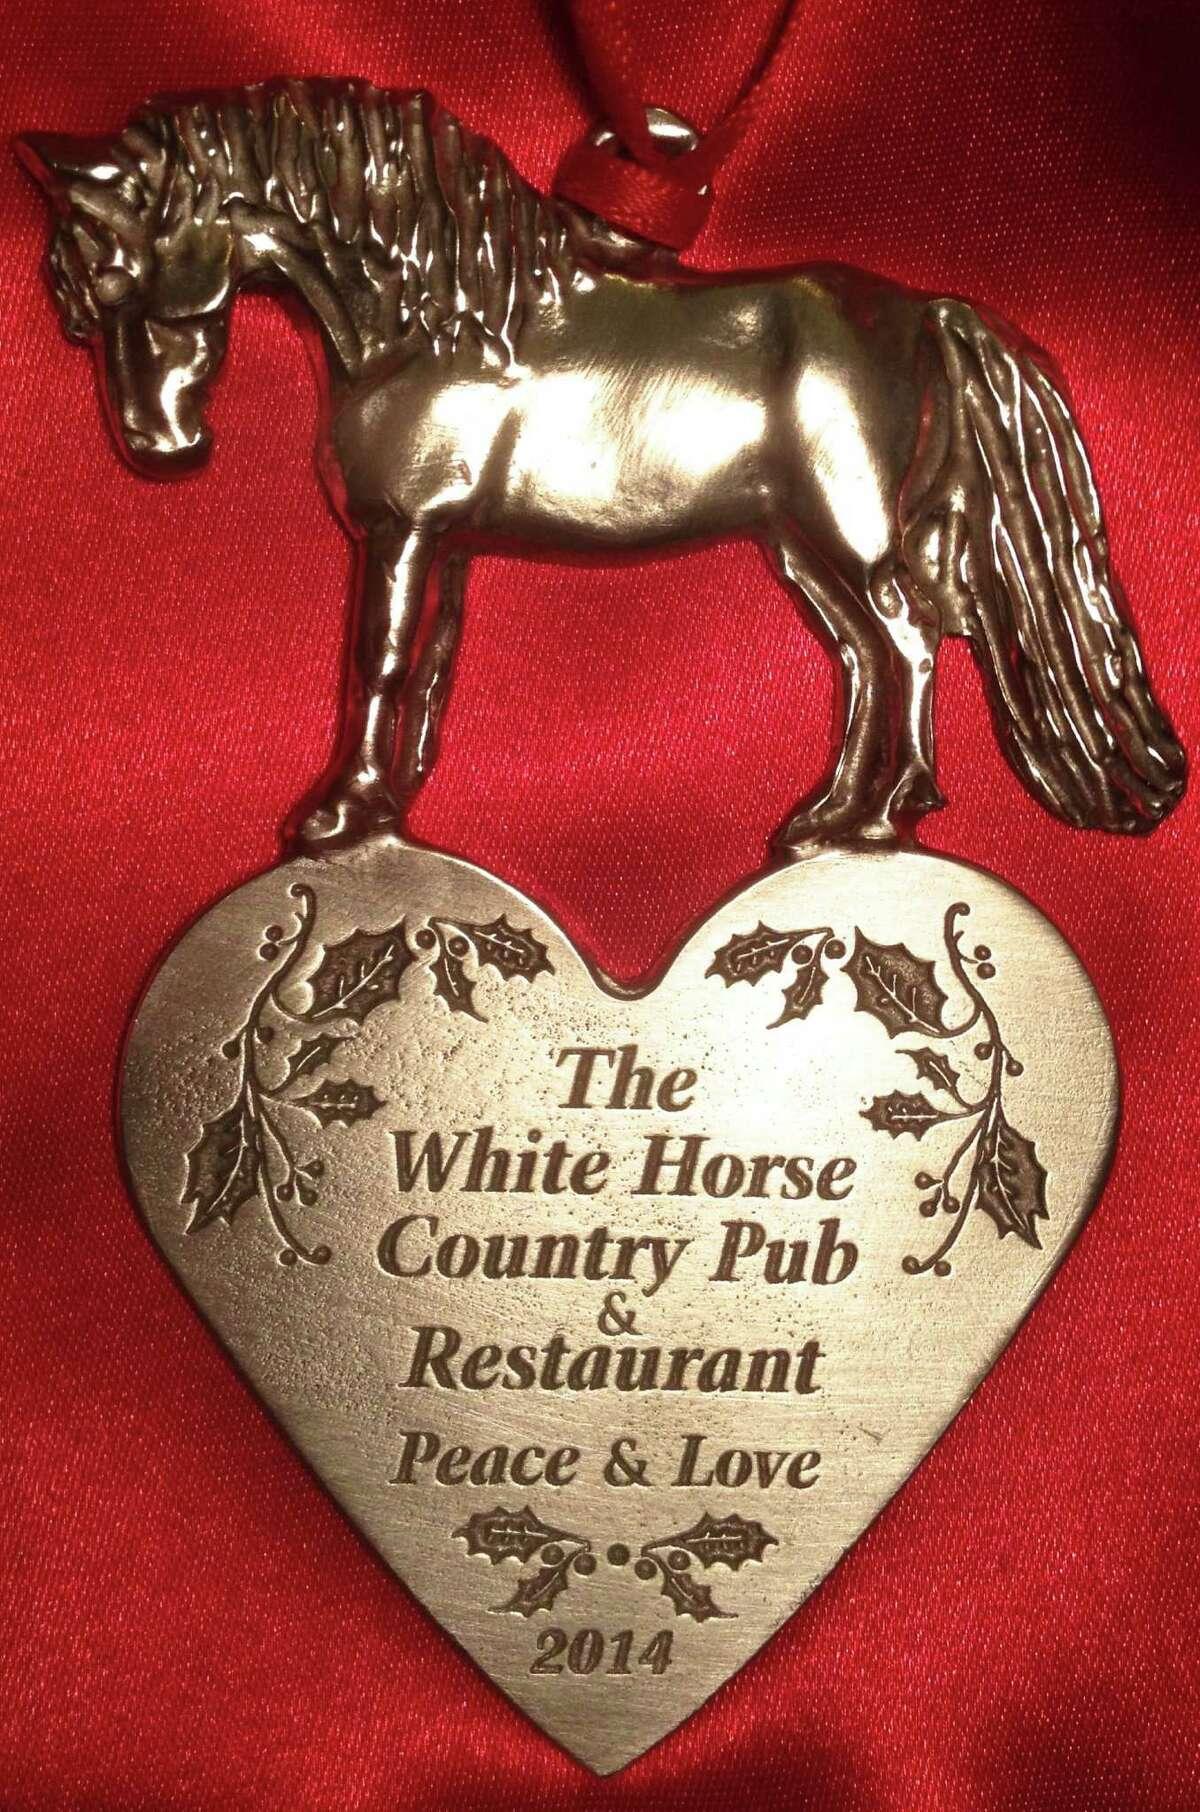 The White Horse Country Pub's 2014 ornament.